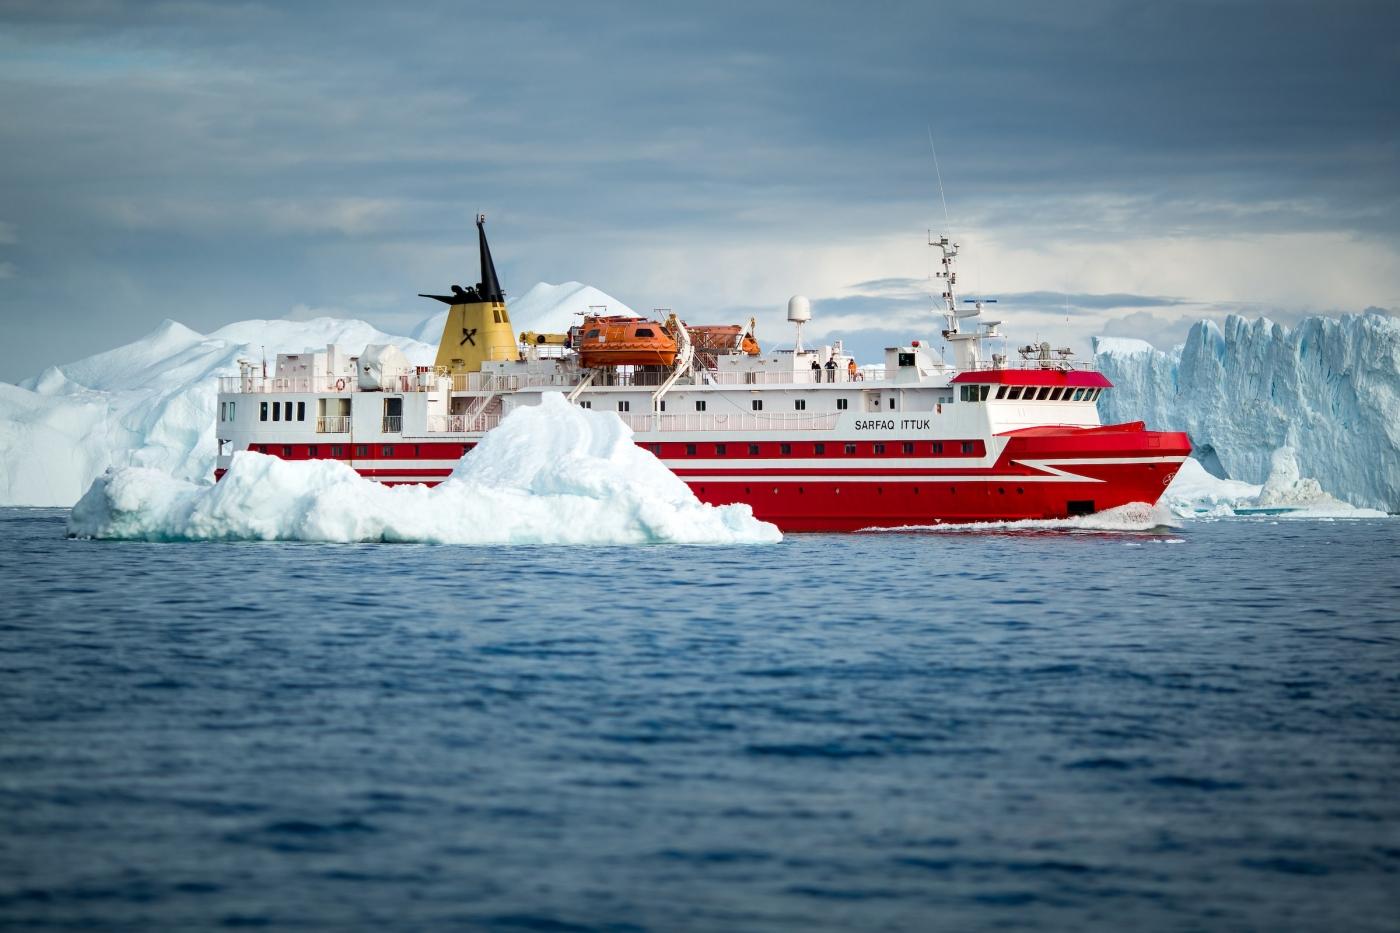 Sarfaq Ittuk, Greenland's passenger ferry, cruising along the edge of the Ilulissat ice fjord. By Mads Pihl